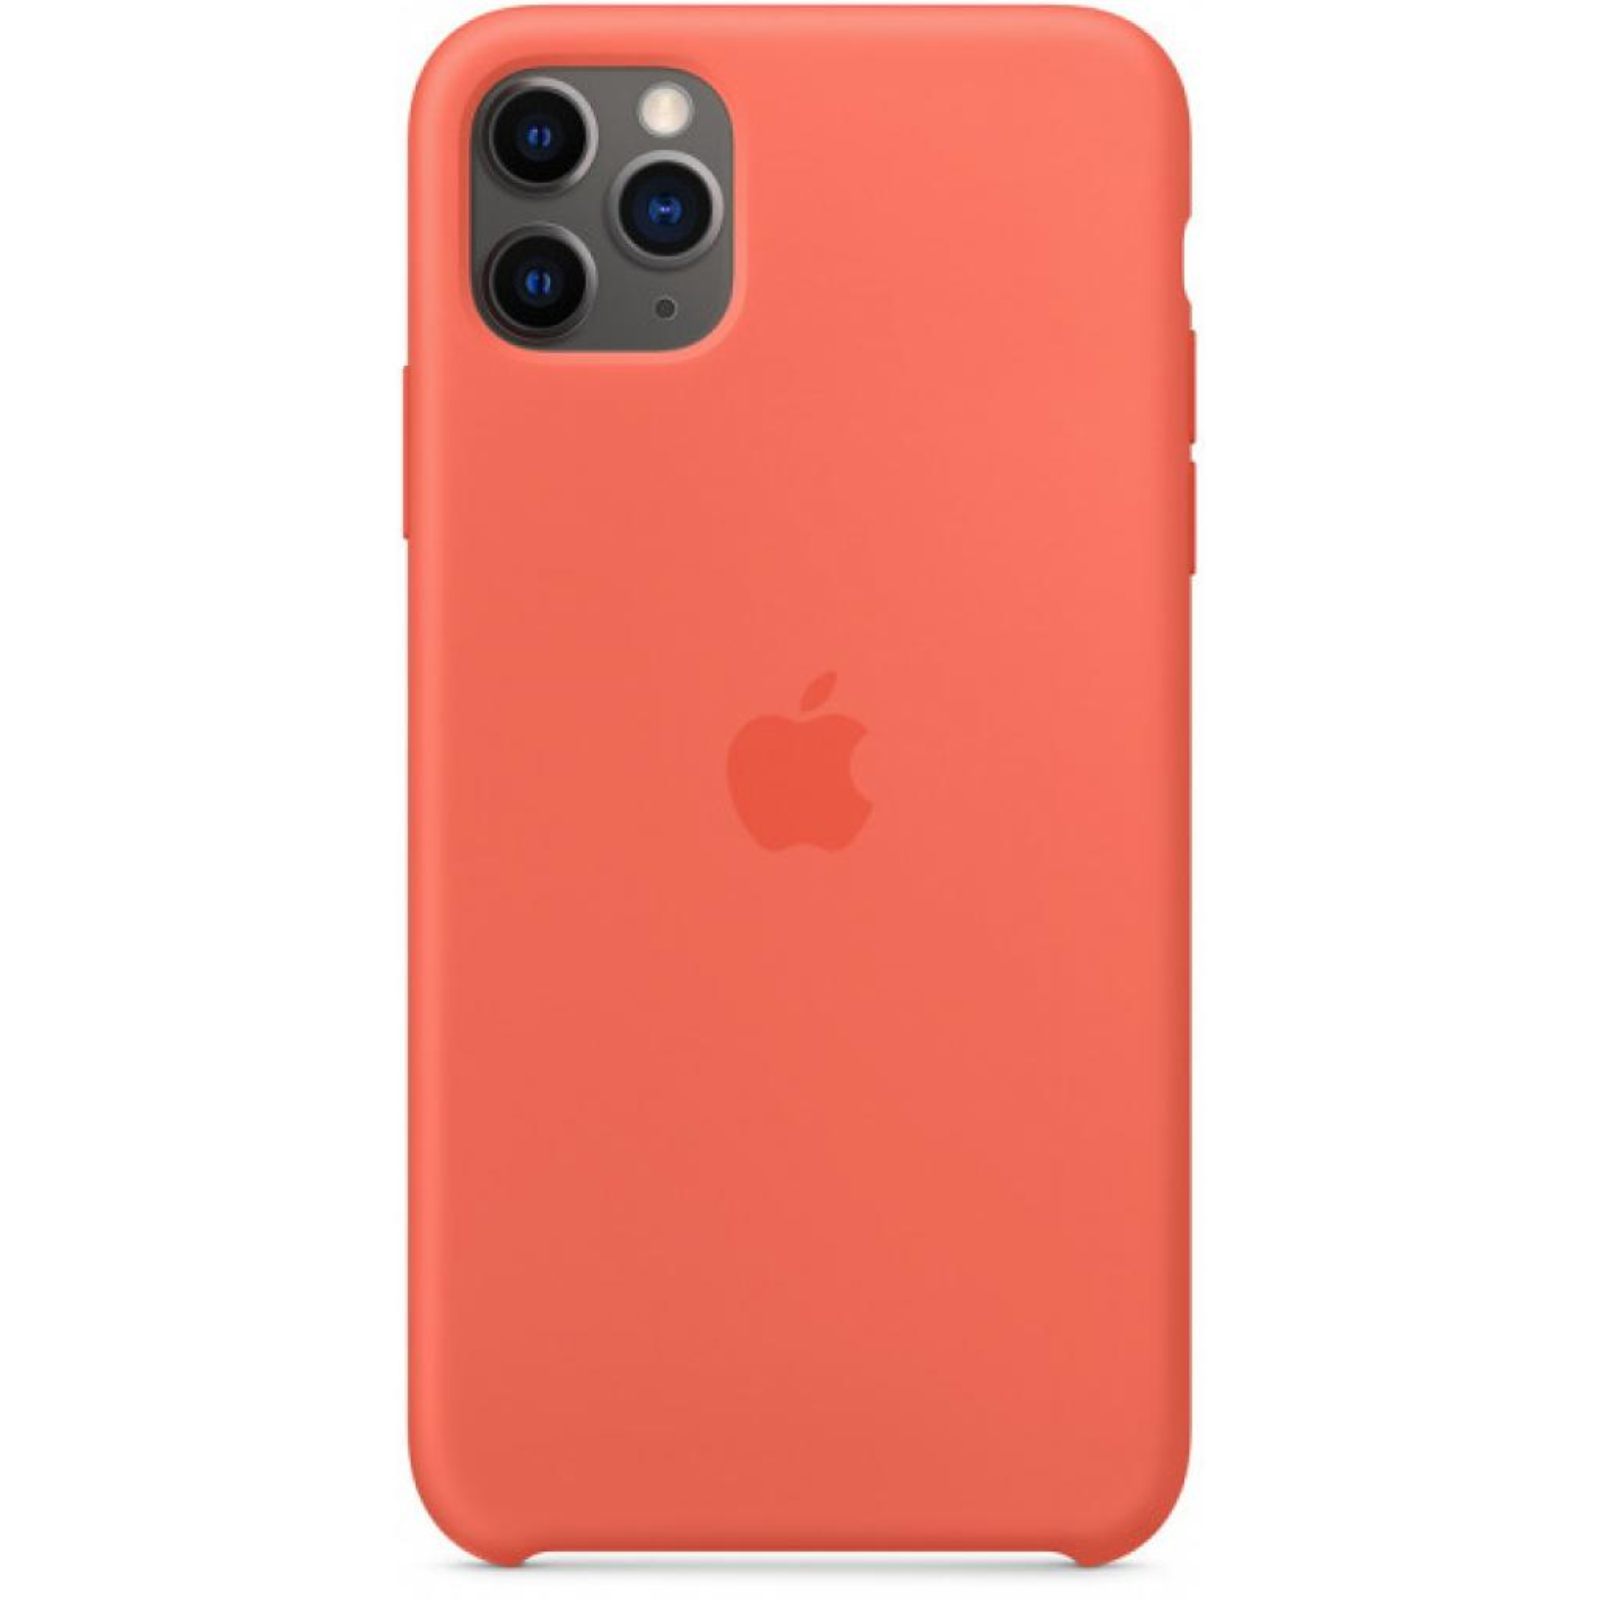 Чехол для моб. телефона Apple iPhone 11 Pro Max Silicone Case - Clementine (Orange) (MX022ZM/A)